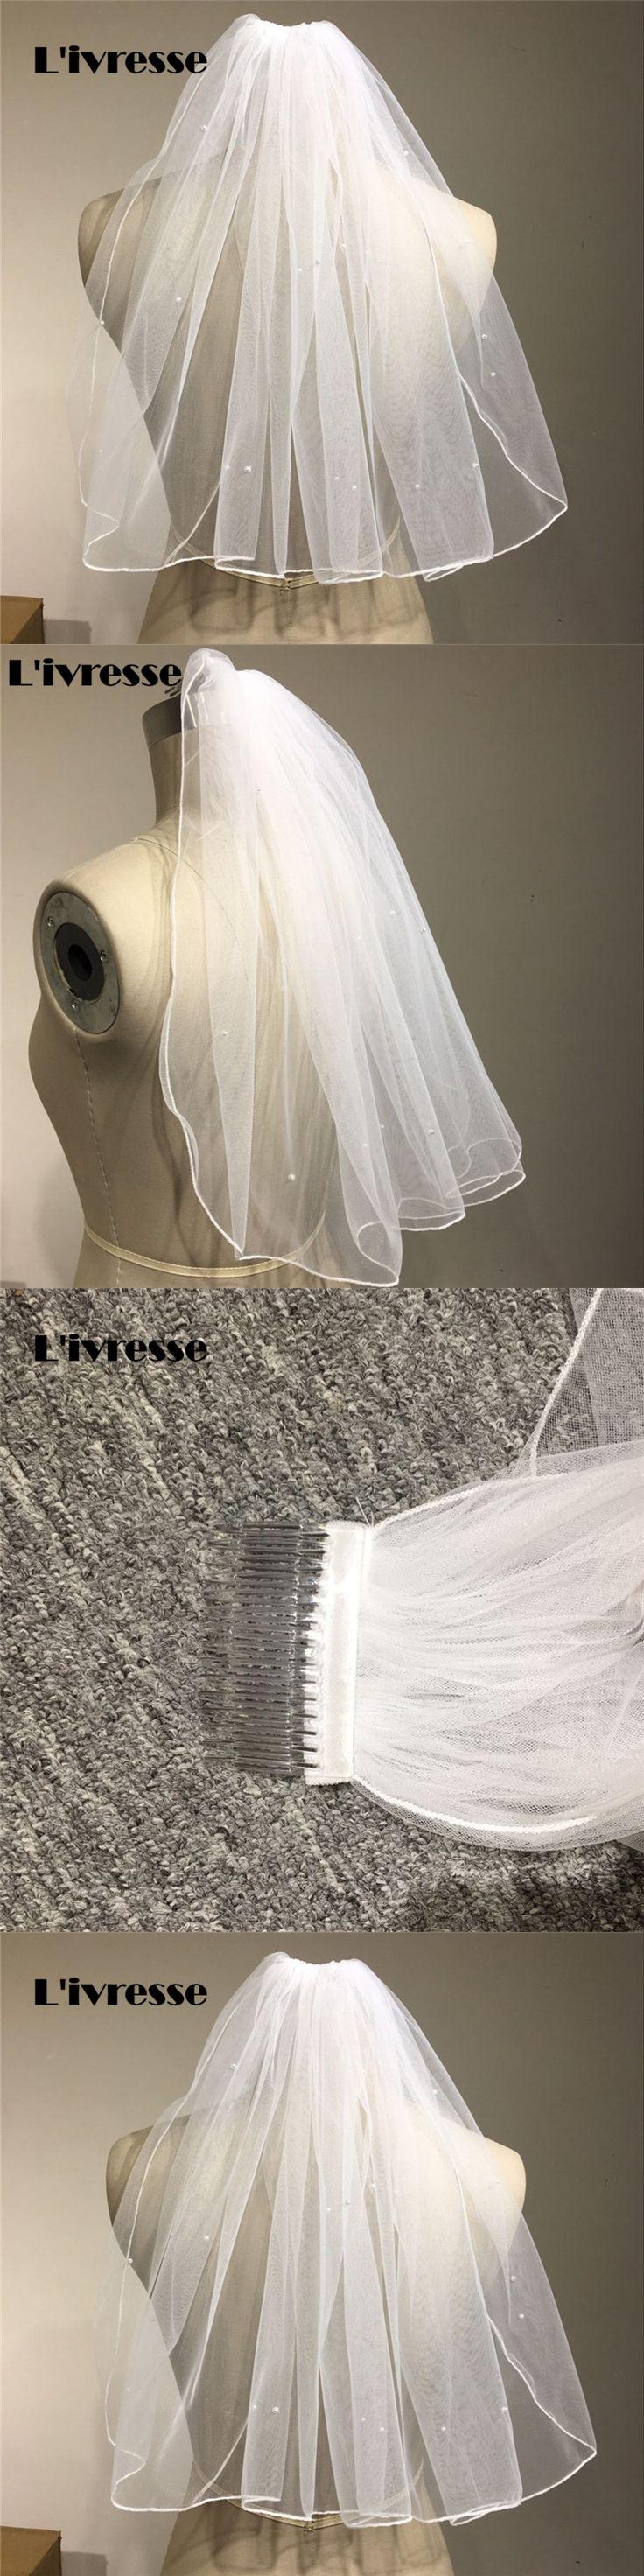 Short Bridal Veils Comb Cheap White Wedding Accessories With Pearls Simple Velos De Novia Voile Mariage New Arrival Pencil